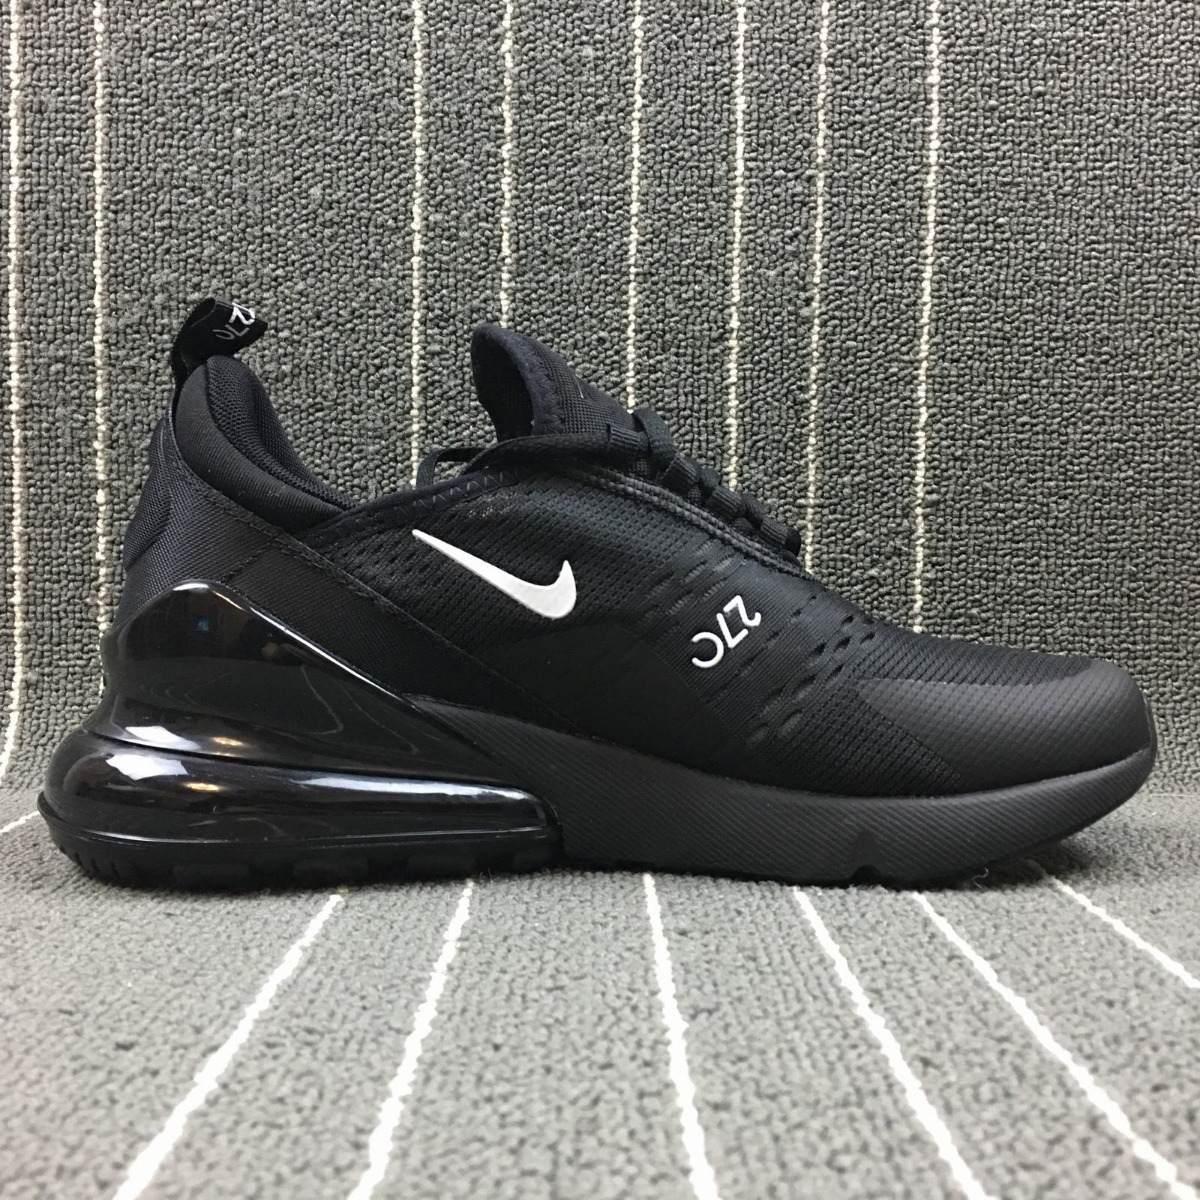 fcf38b21ae4e3 zapatillas nike air max 270 black 40-45 exclusive line. Cargando zoom.